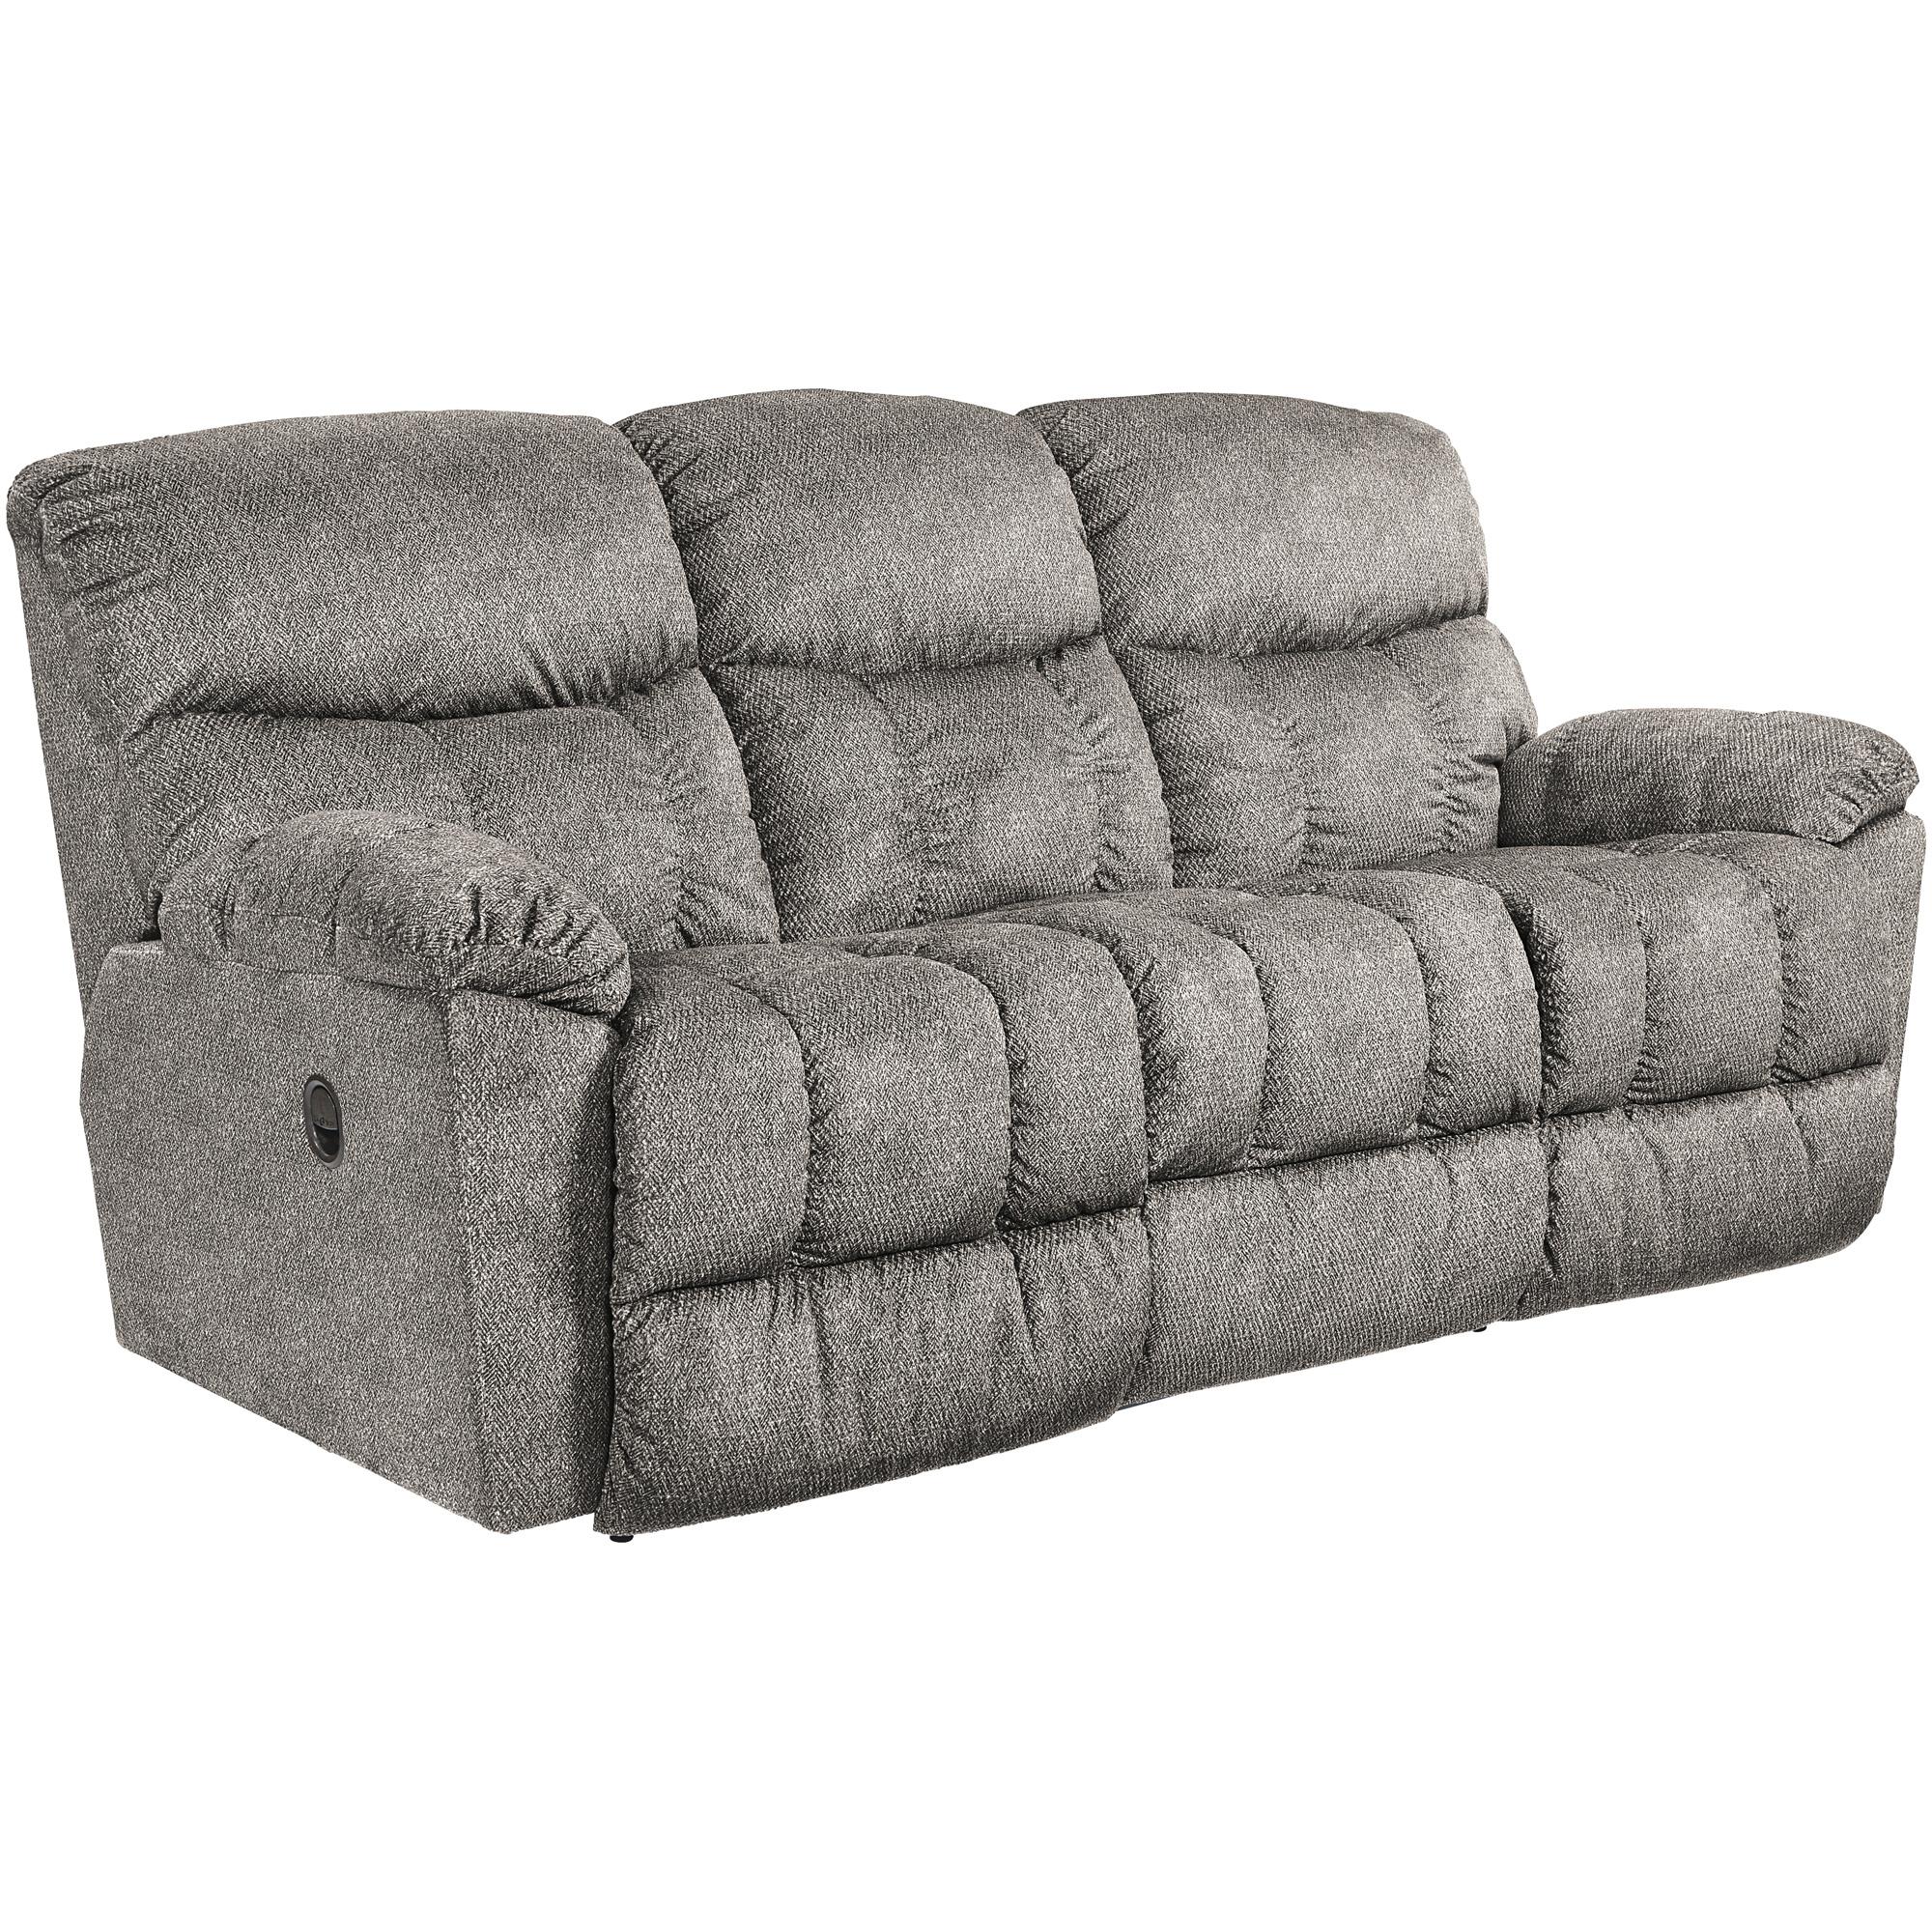 La-Z-Boy | Morrison Silver Reclining Sofa